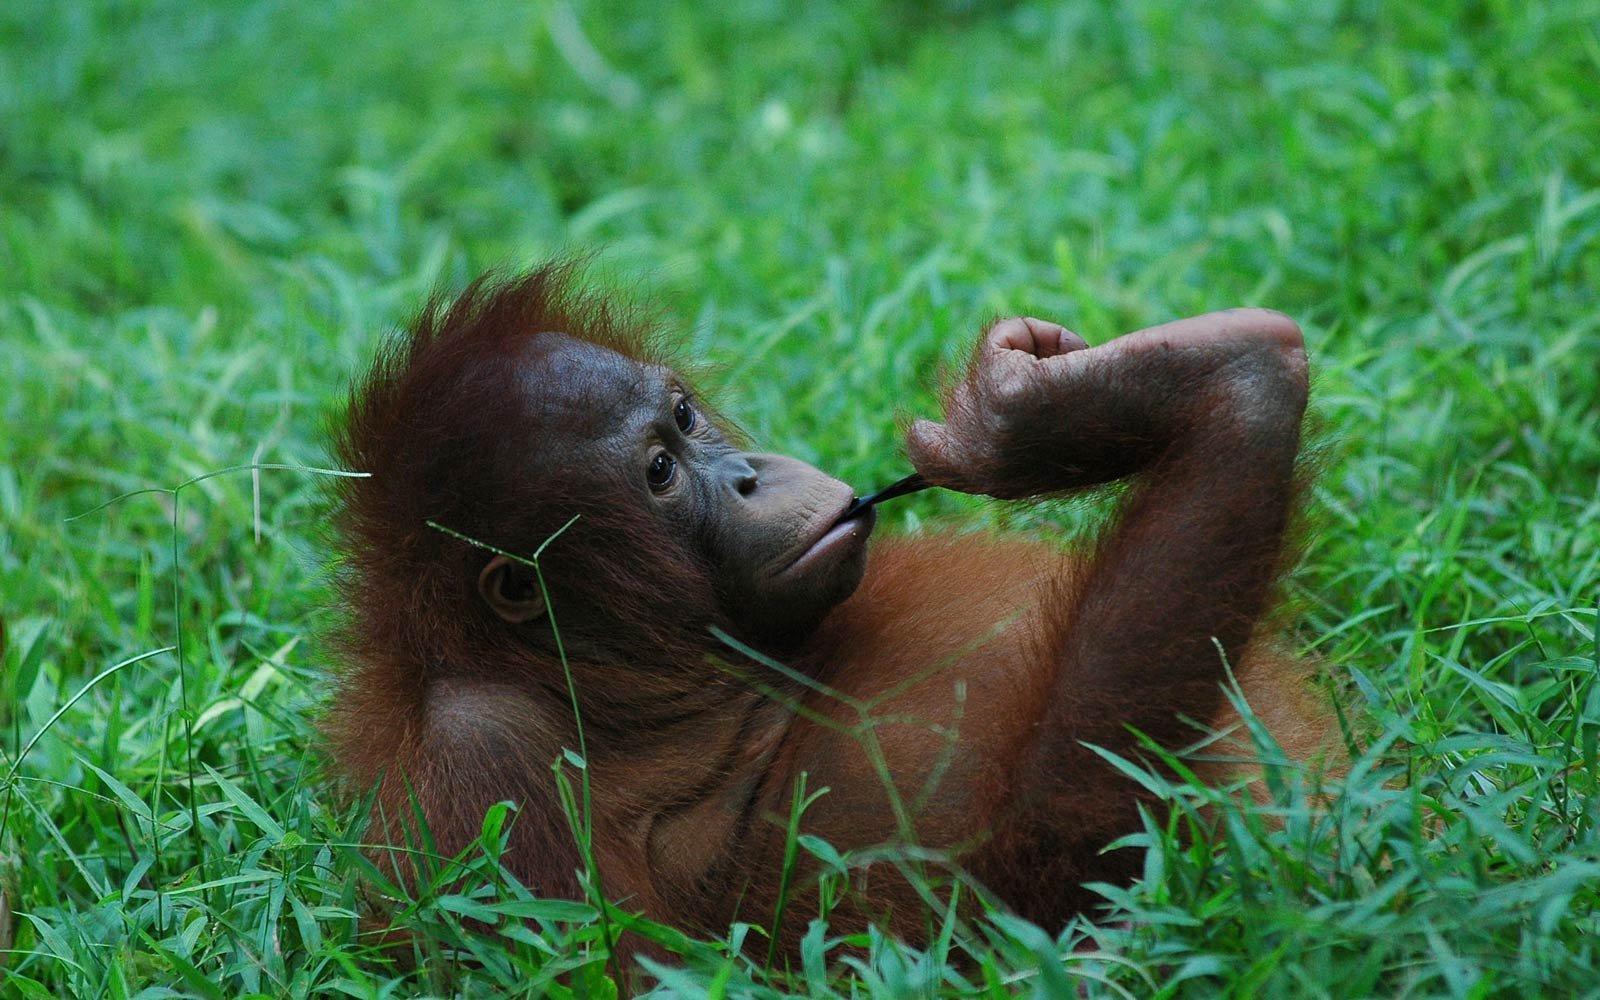 Q Son Los Orangutanes Orangutan Wallpapers H...